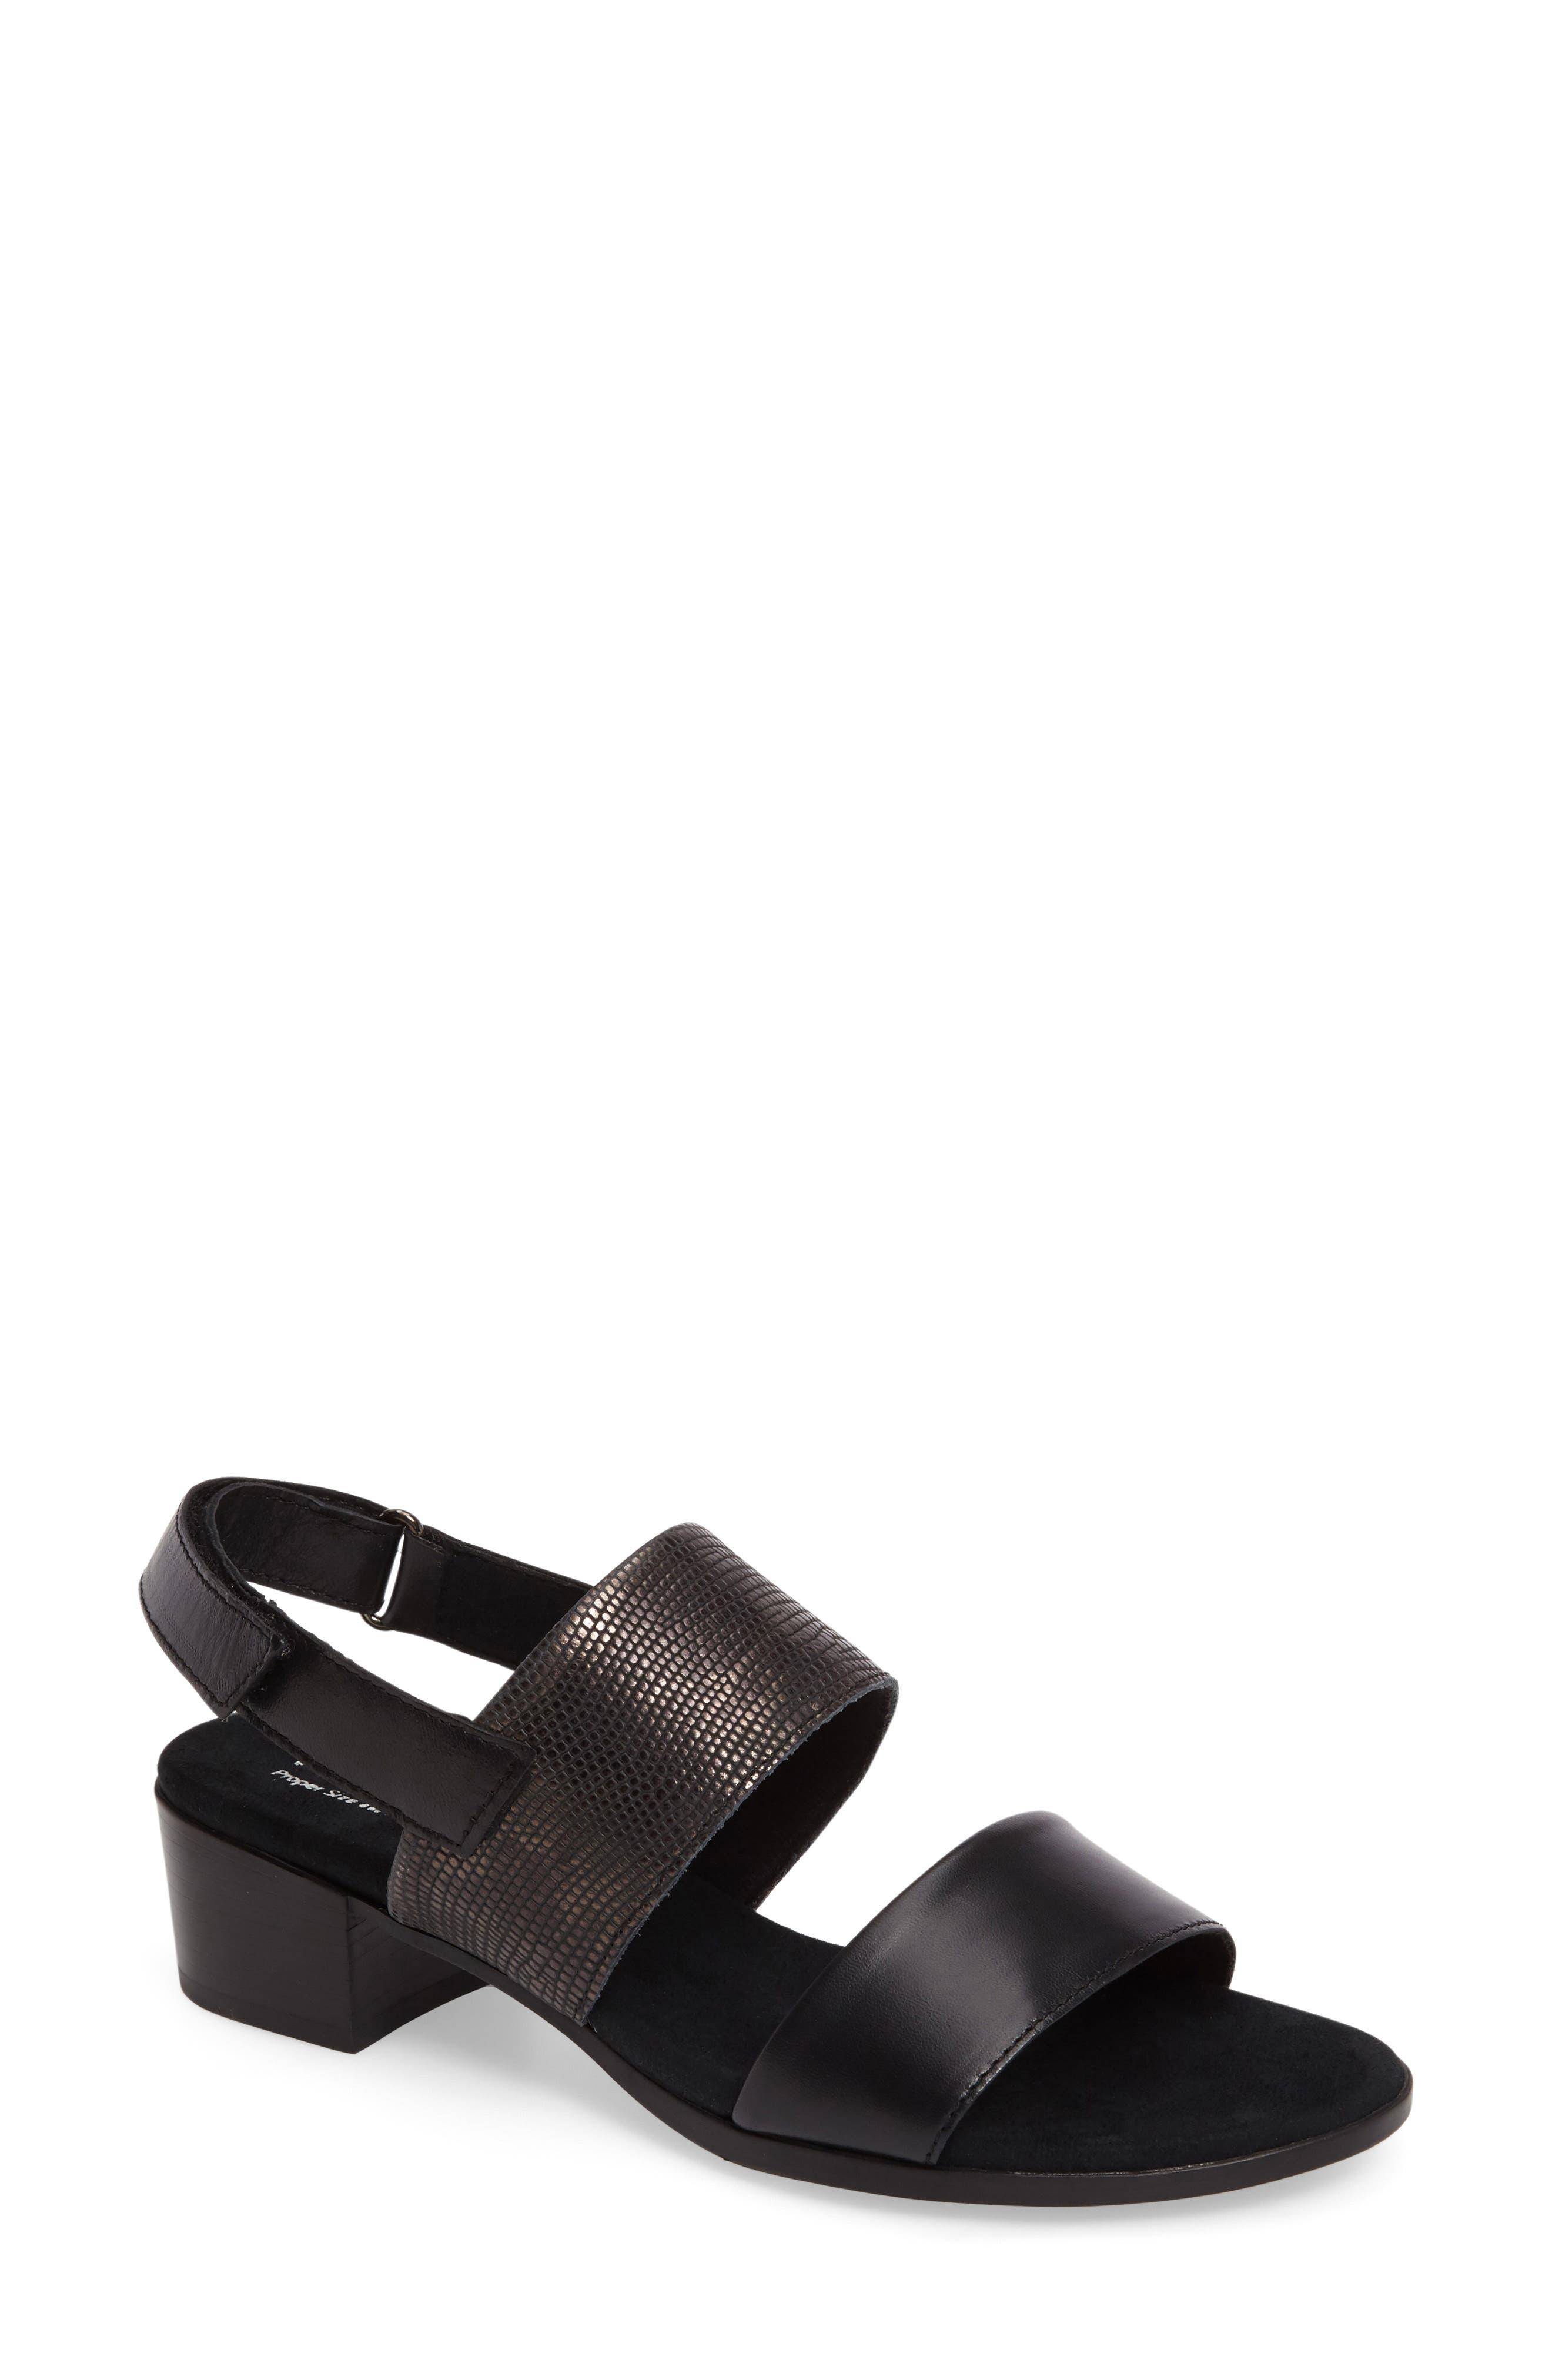 Kristal Sandal,                         Main,                         color, BLACK LIZARD PRINT LEATHER